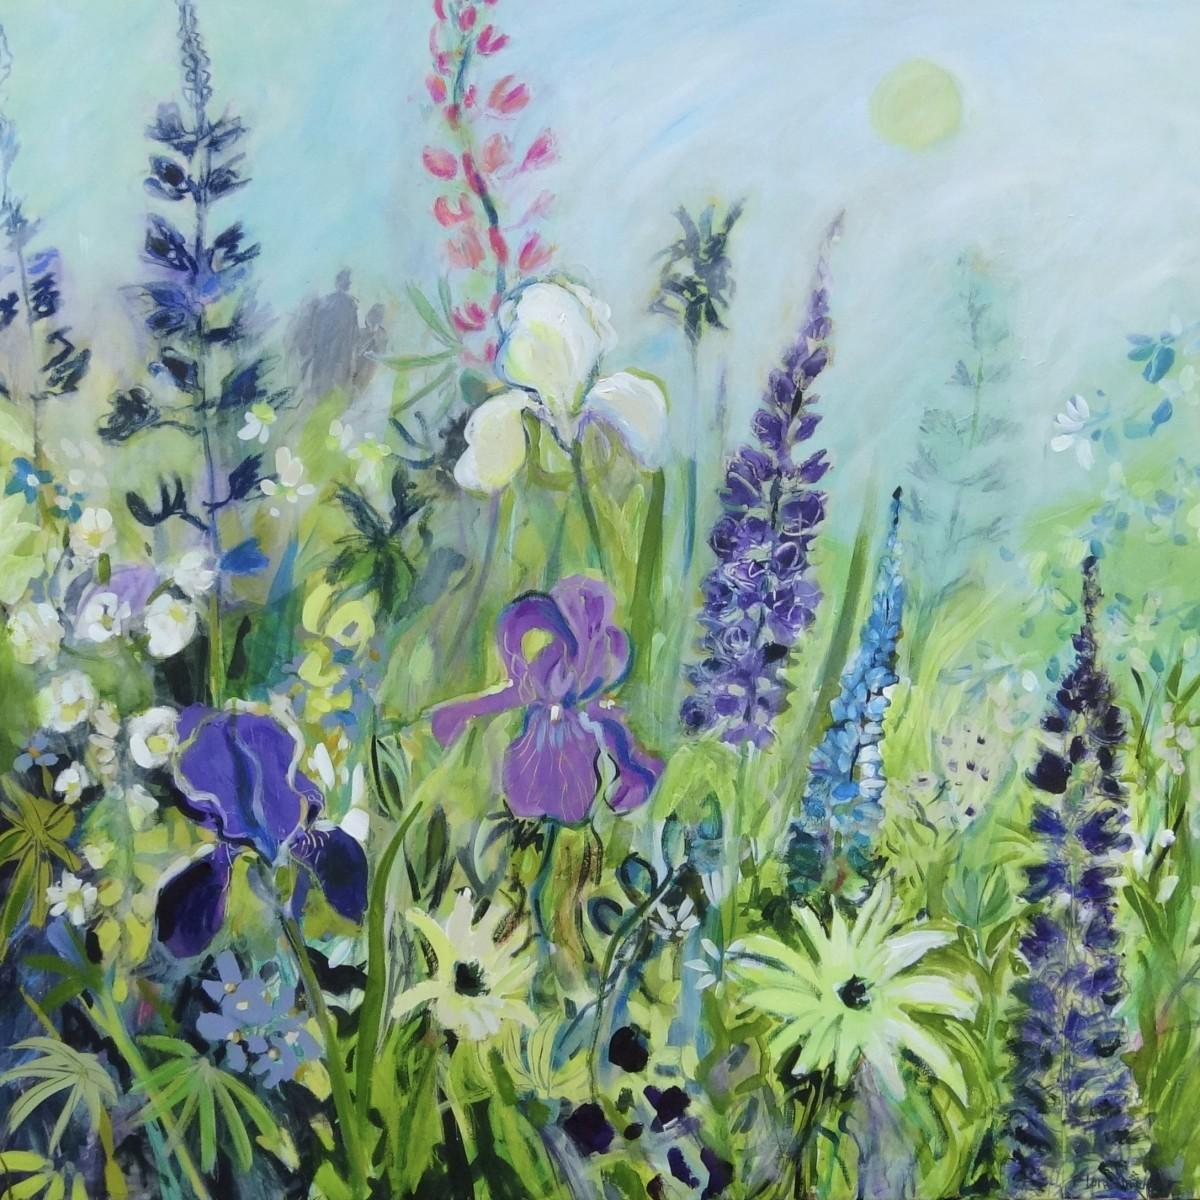 Field of Grace by Flora Doehler